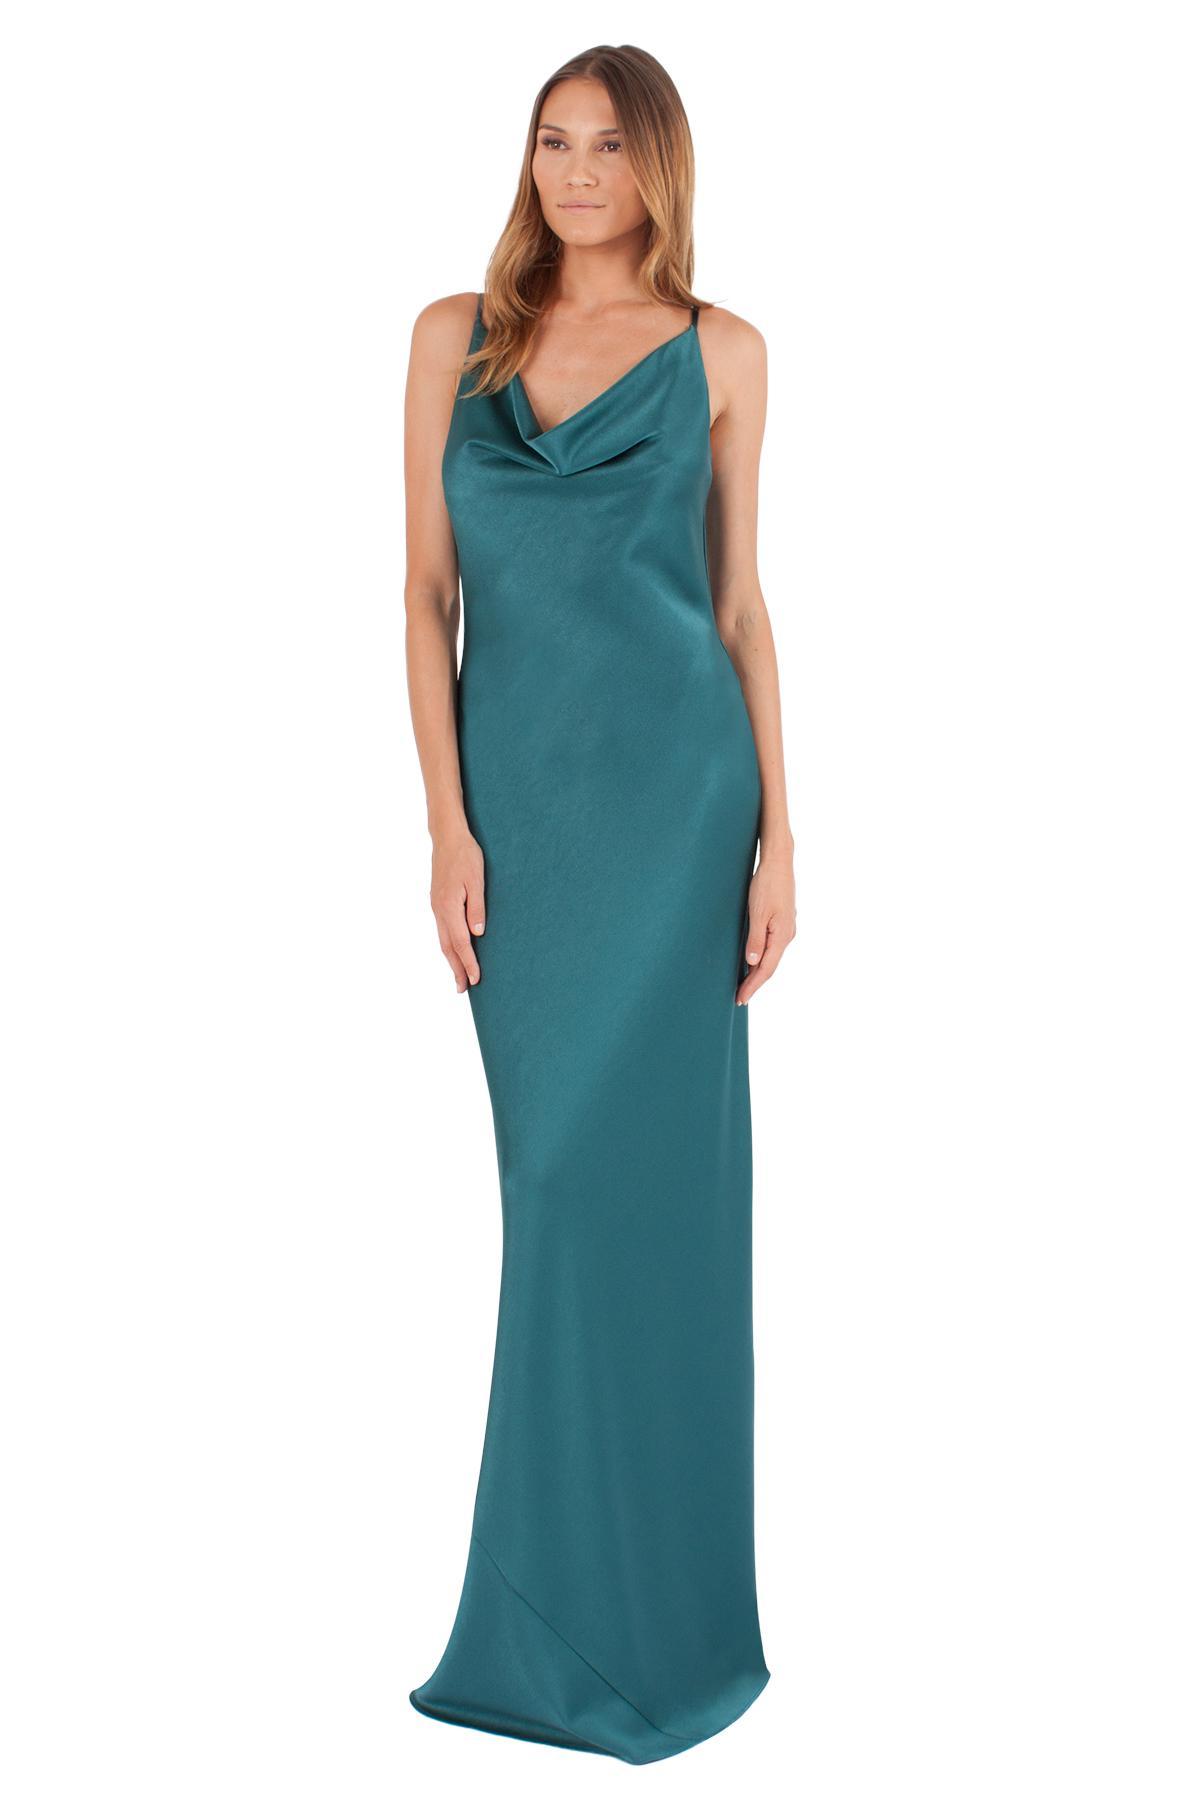 Lyst - Black Halo Bessette Gown in Blue